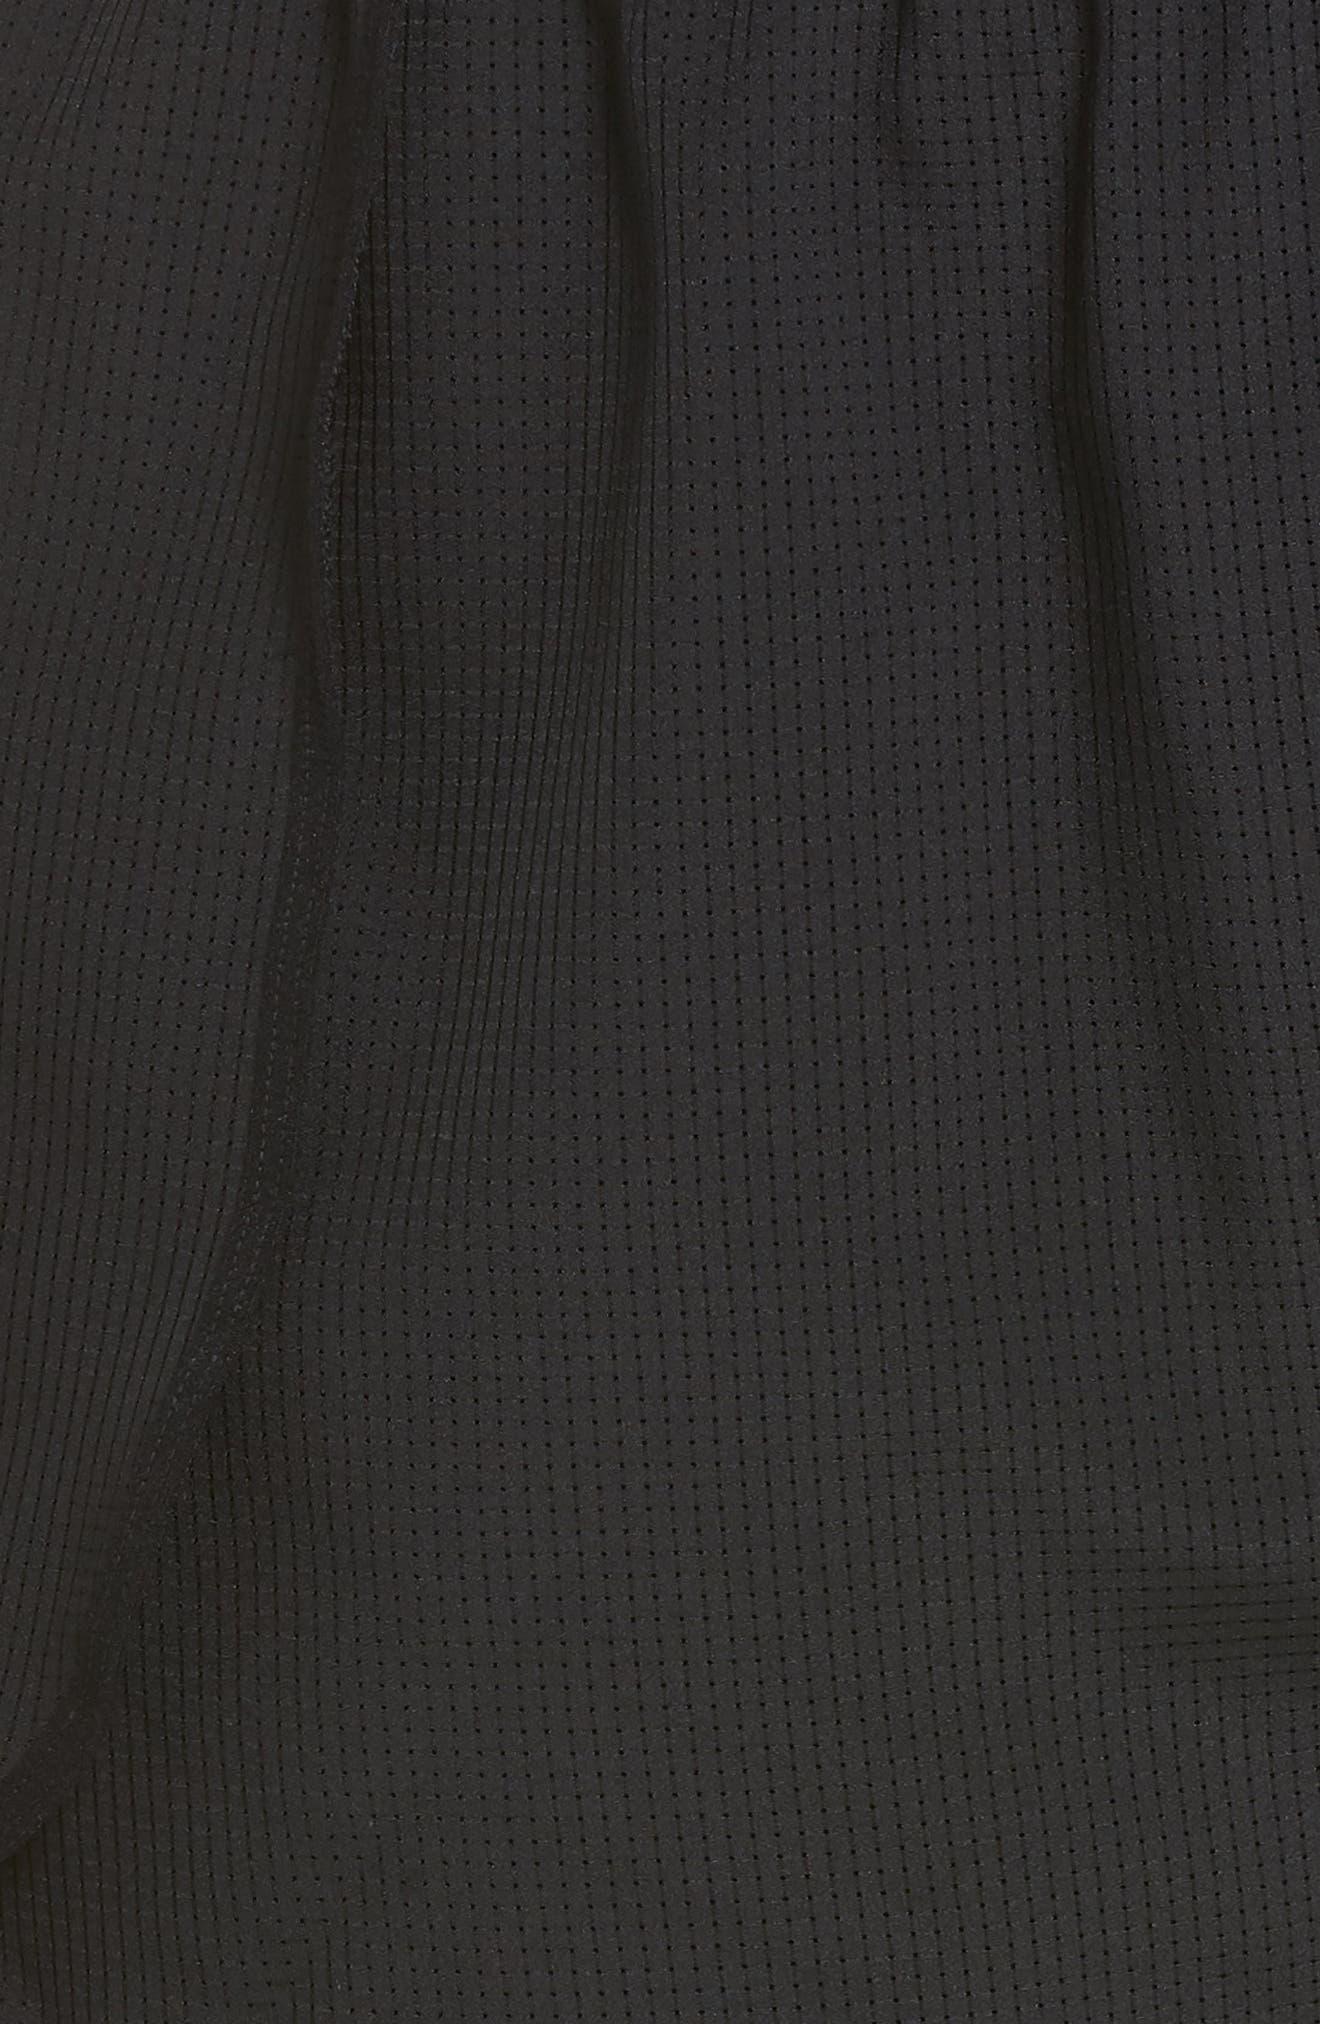 NIKE,                             Flex Bliss 2-in-1 Training Shorts,                             Alternate thumbnail 5, color,                             010